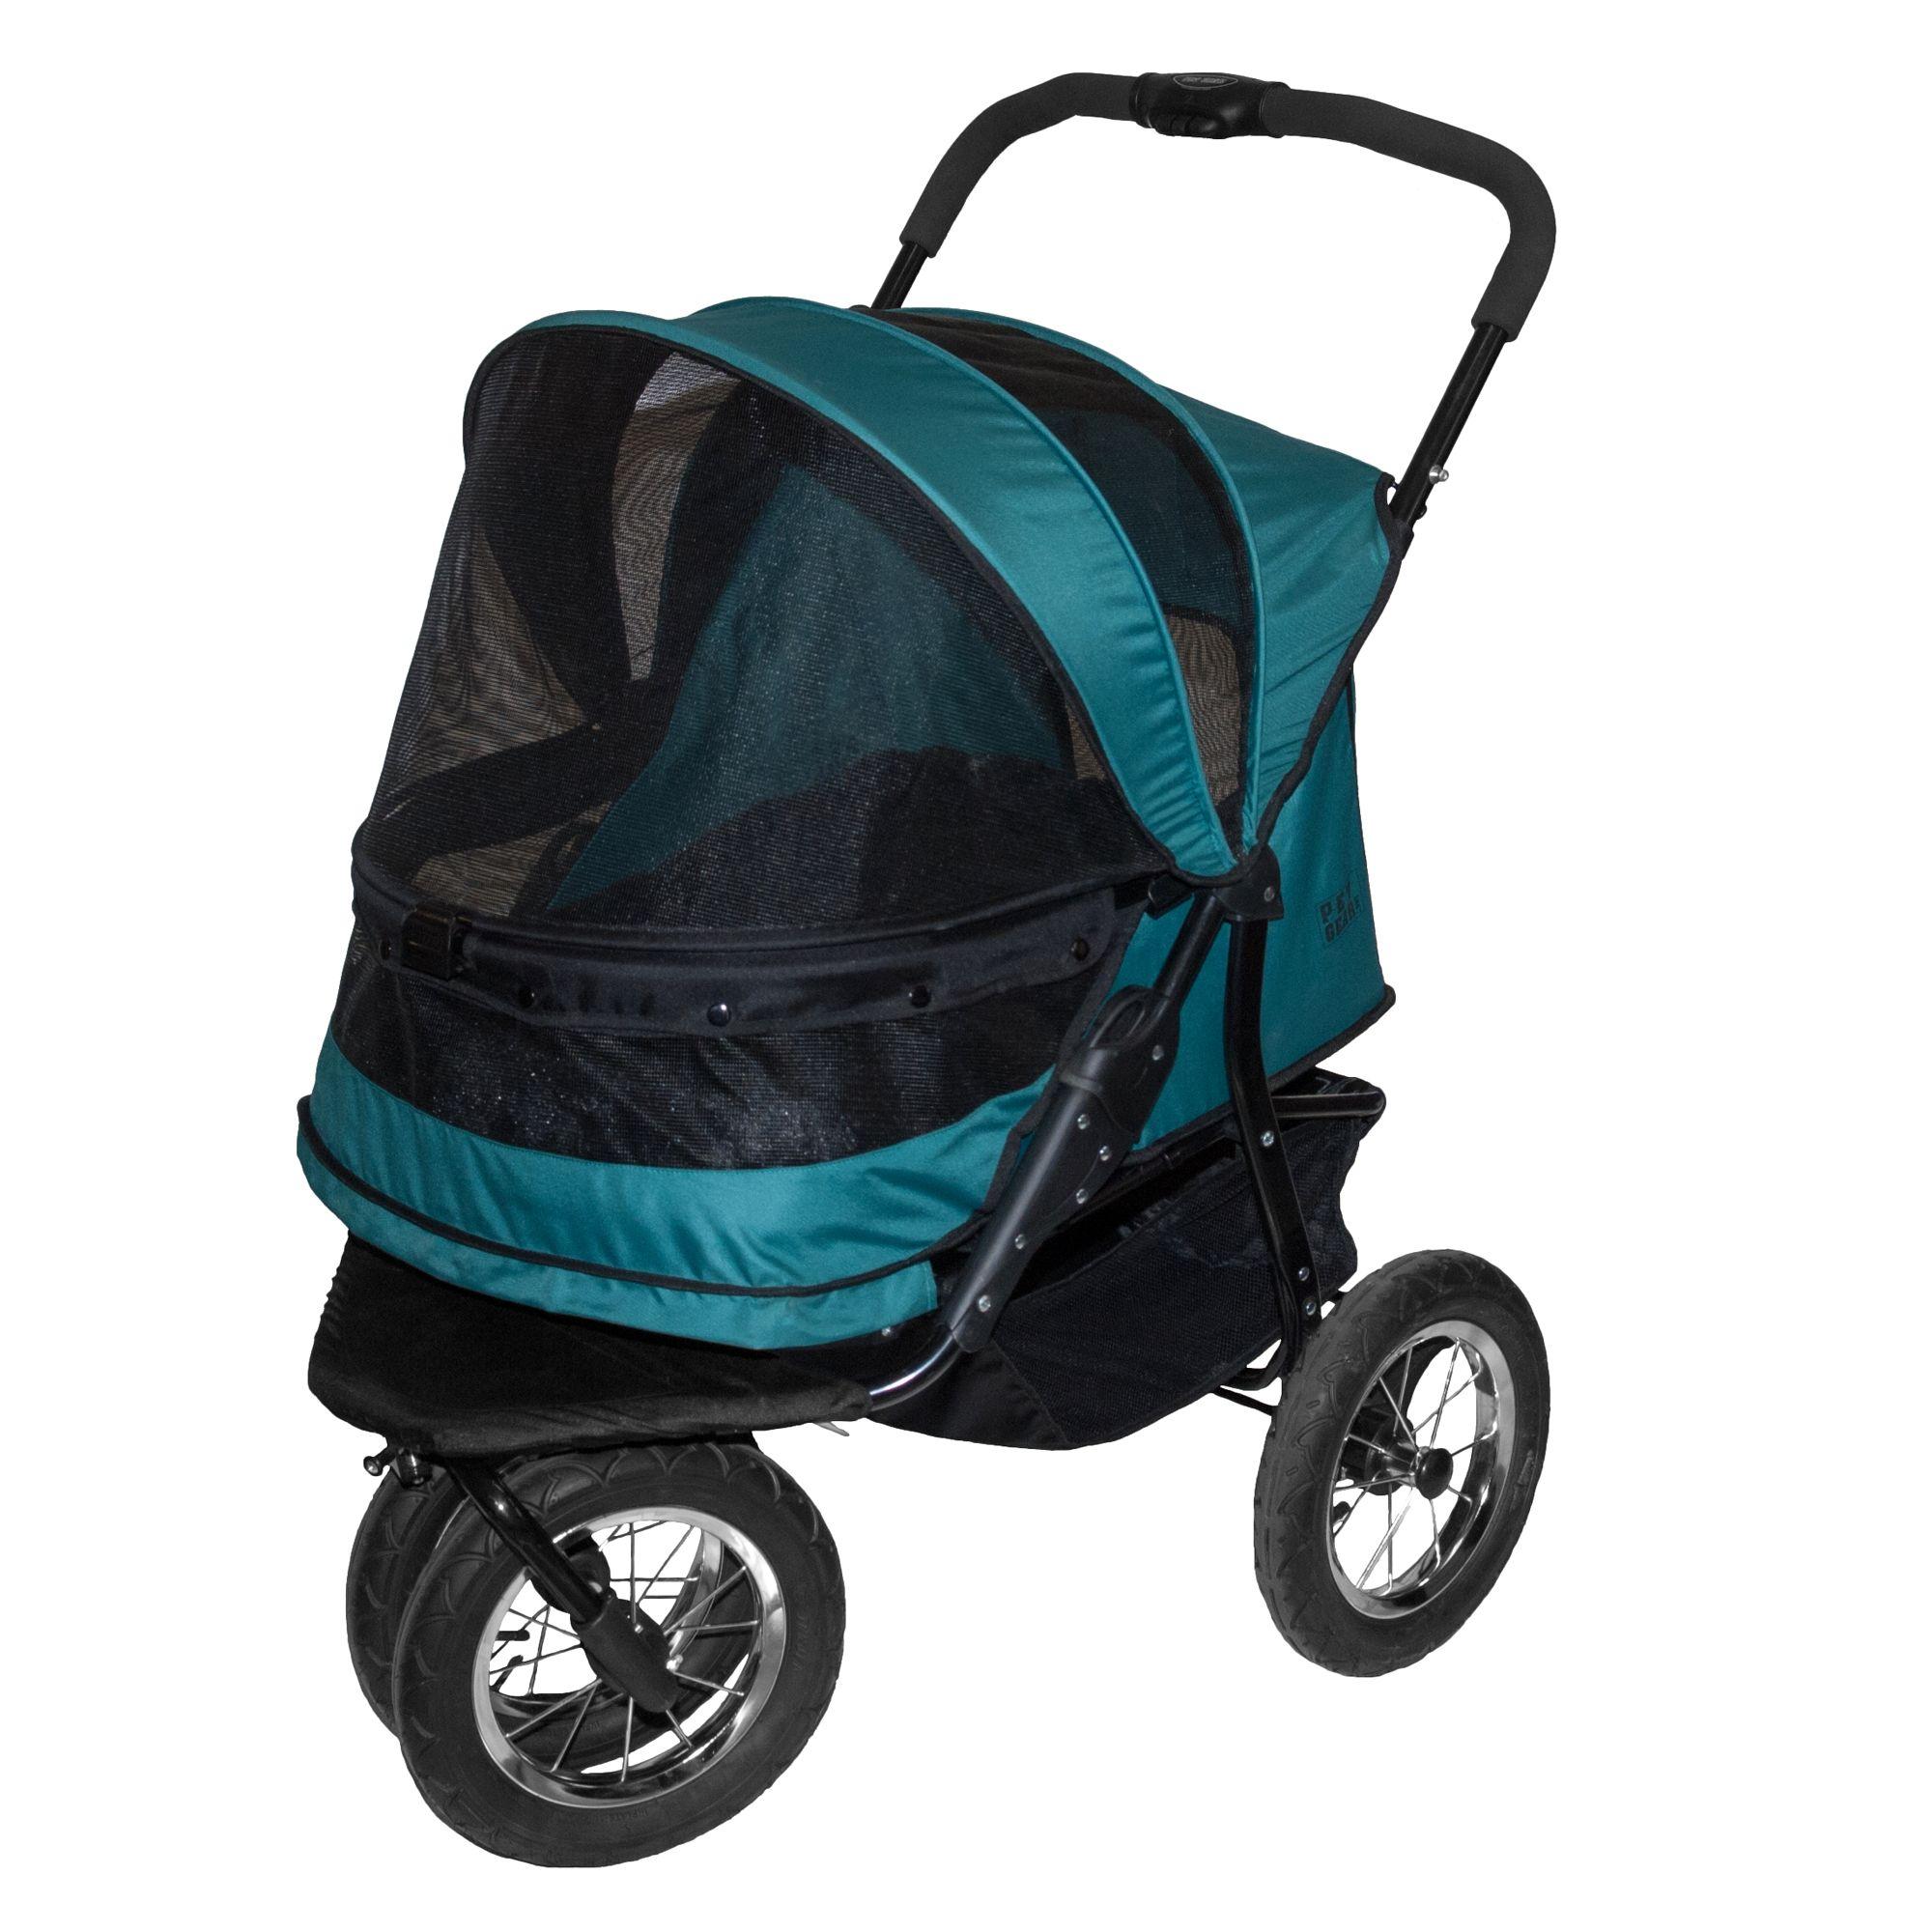 "Pet Gear NO-ZIP Double Pet Stroller size: 27""L x 20""W x 23""H, Blue 5249104"